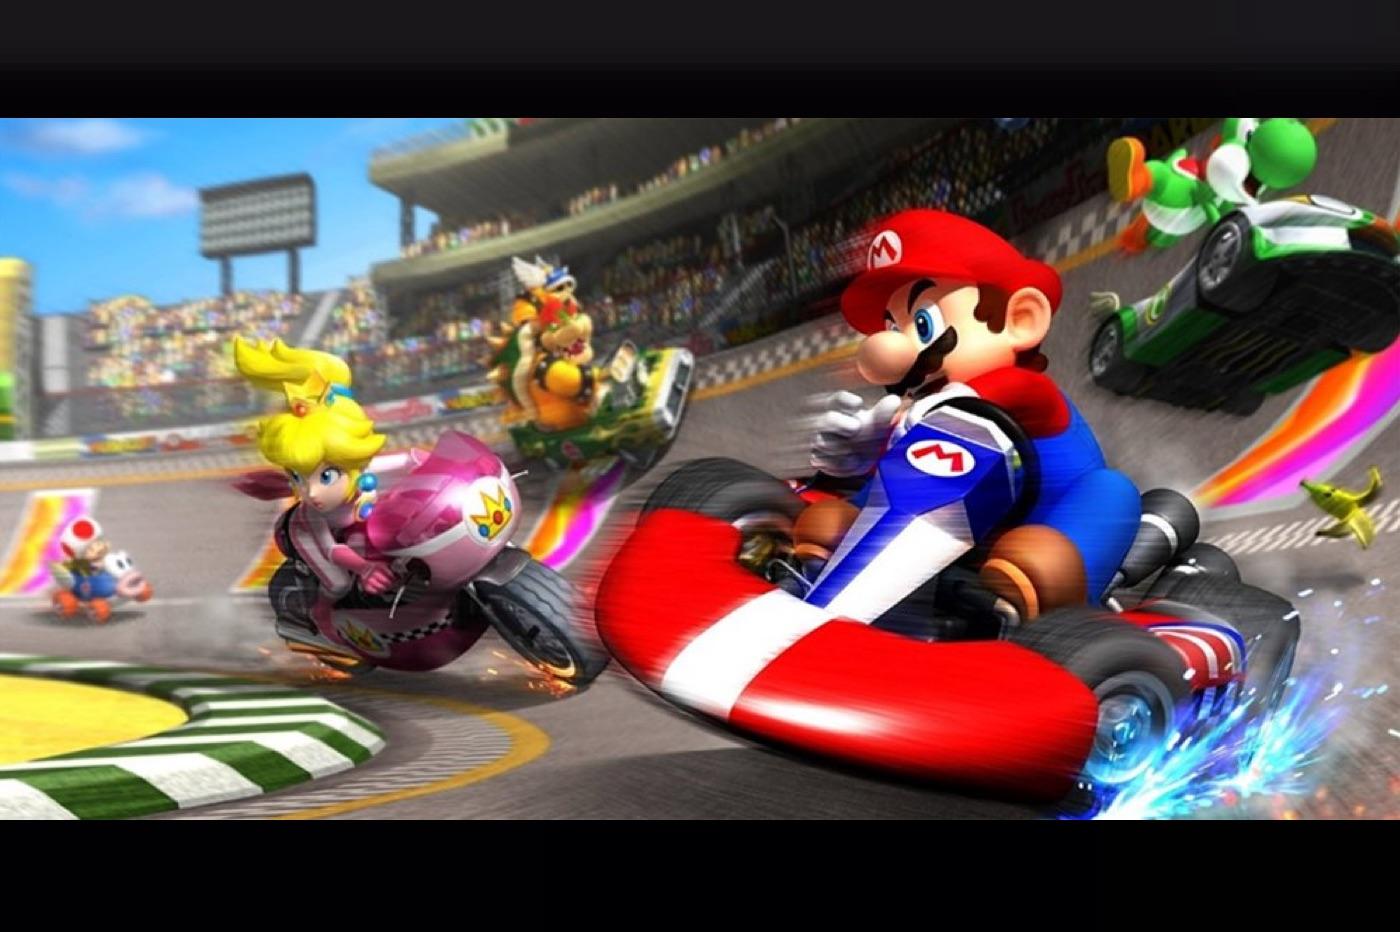 Mario Kart Tour jeu mobile de Nintendo